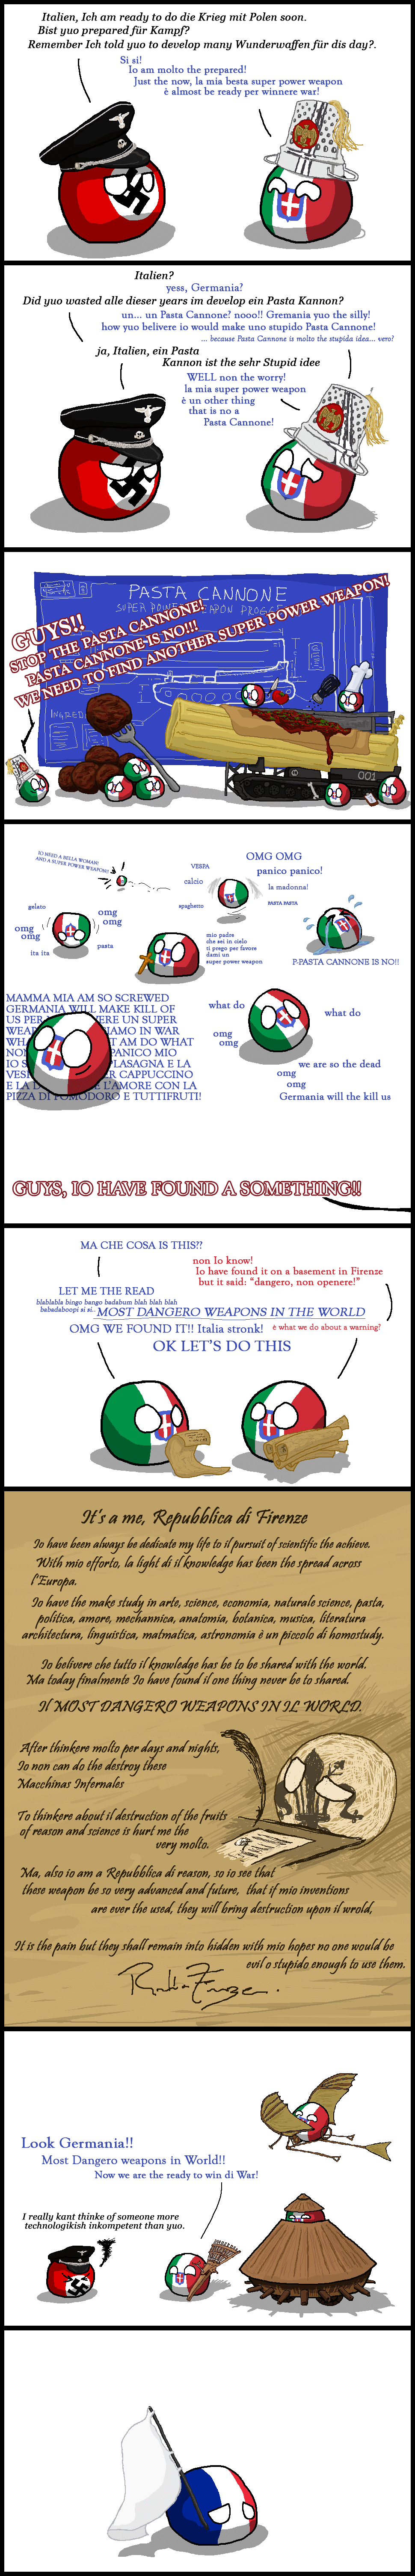 Sf0zMQv (1)